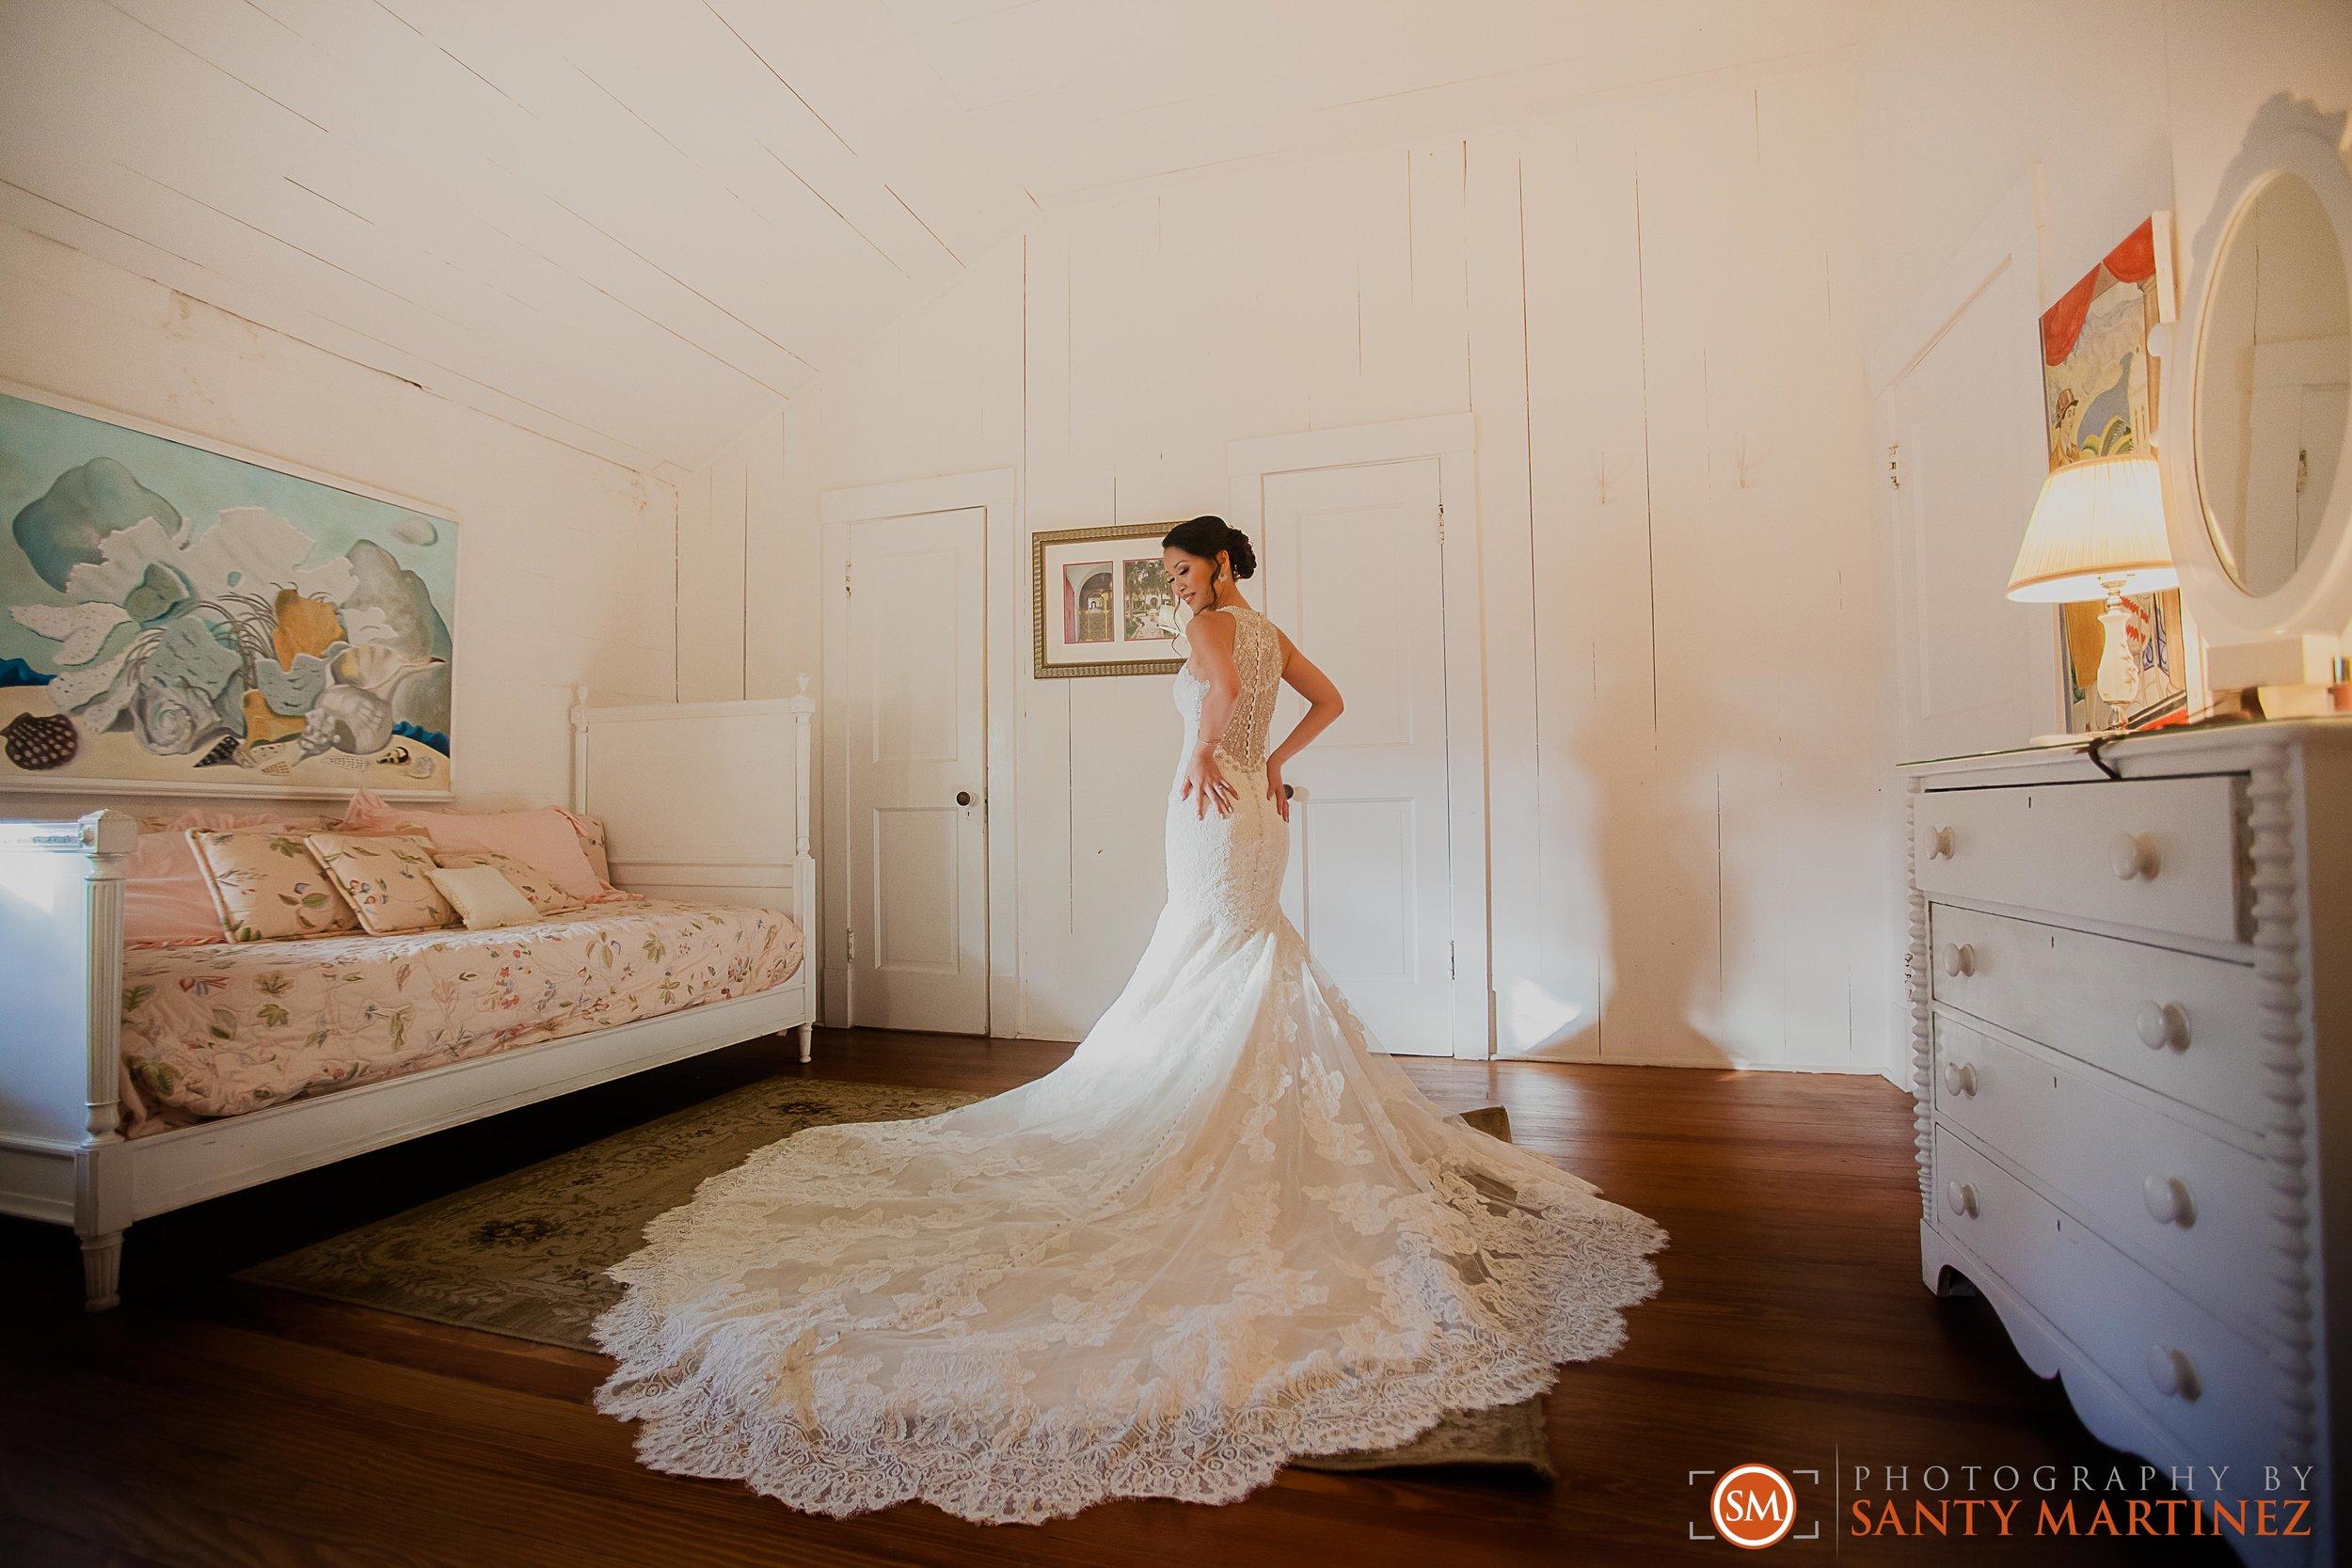 Wedding Bonnet House - Photography by Santy Martinez-5.jpg